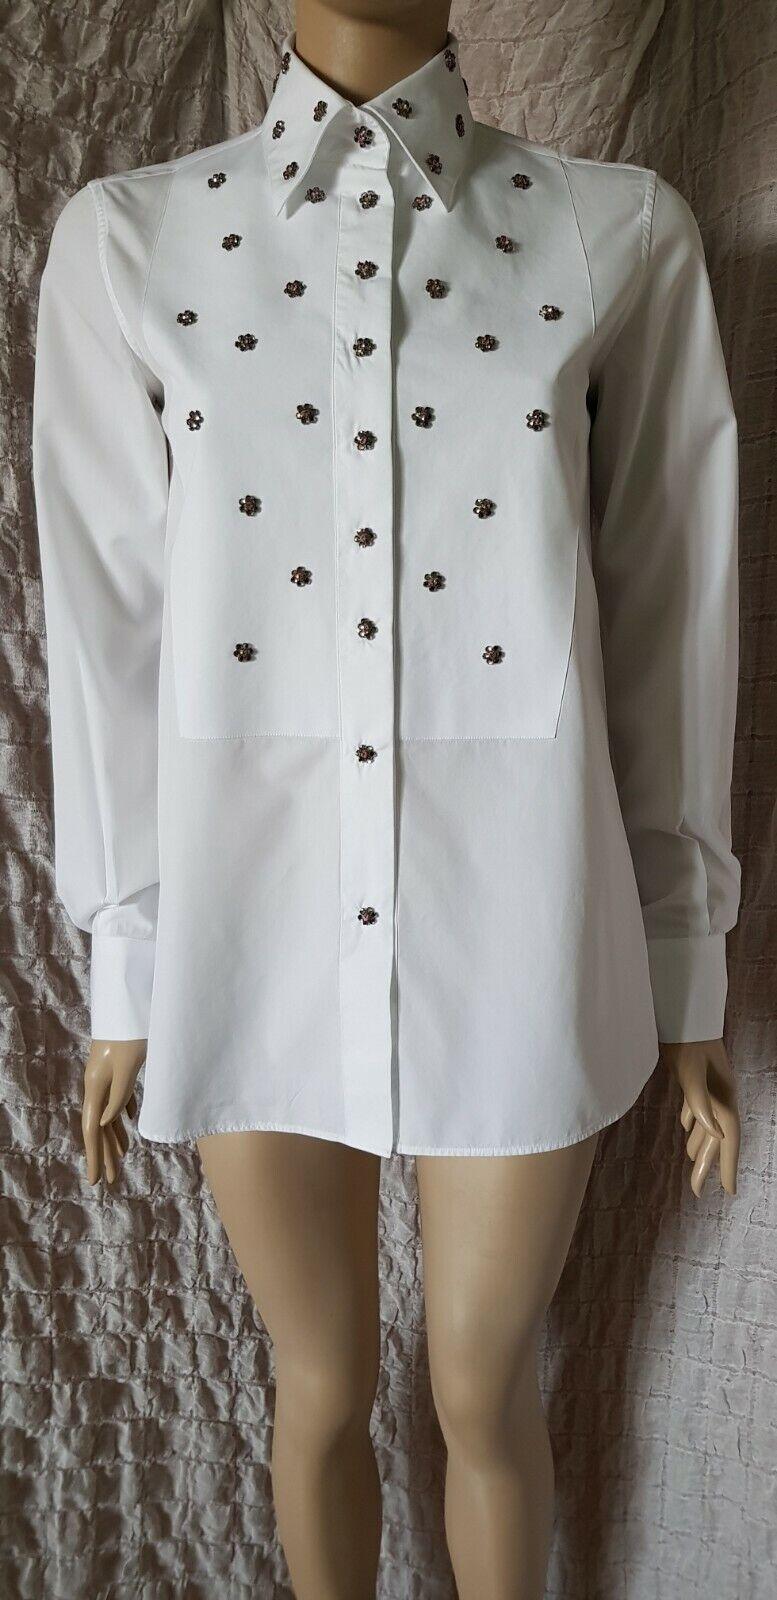 Ermanno Scervino glass brass white cotton plain jewelled embellished shirt